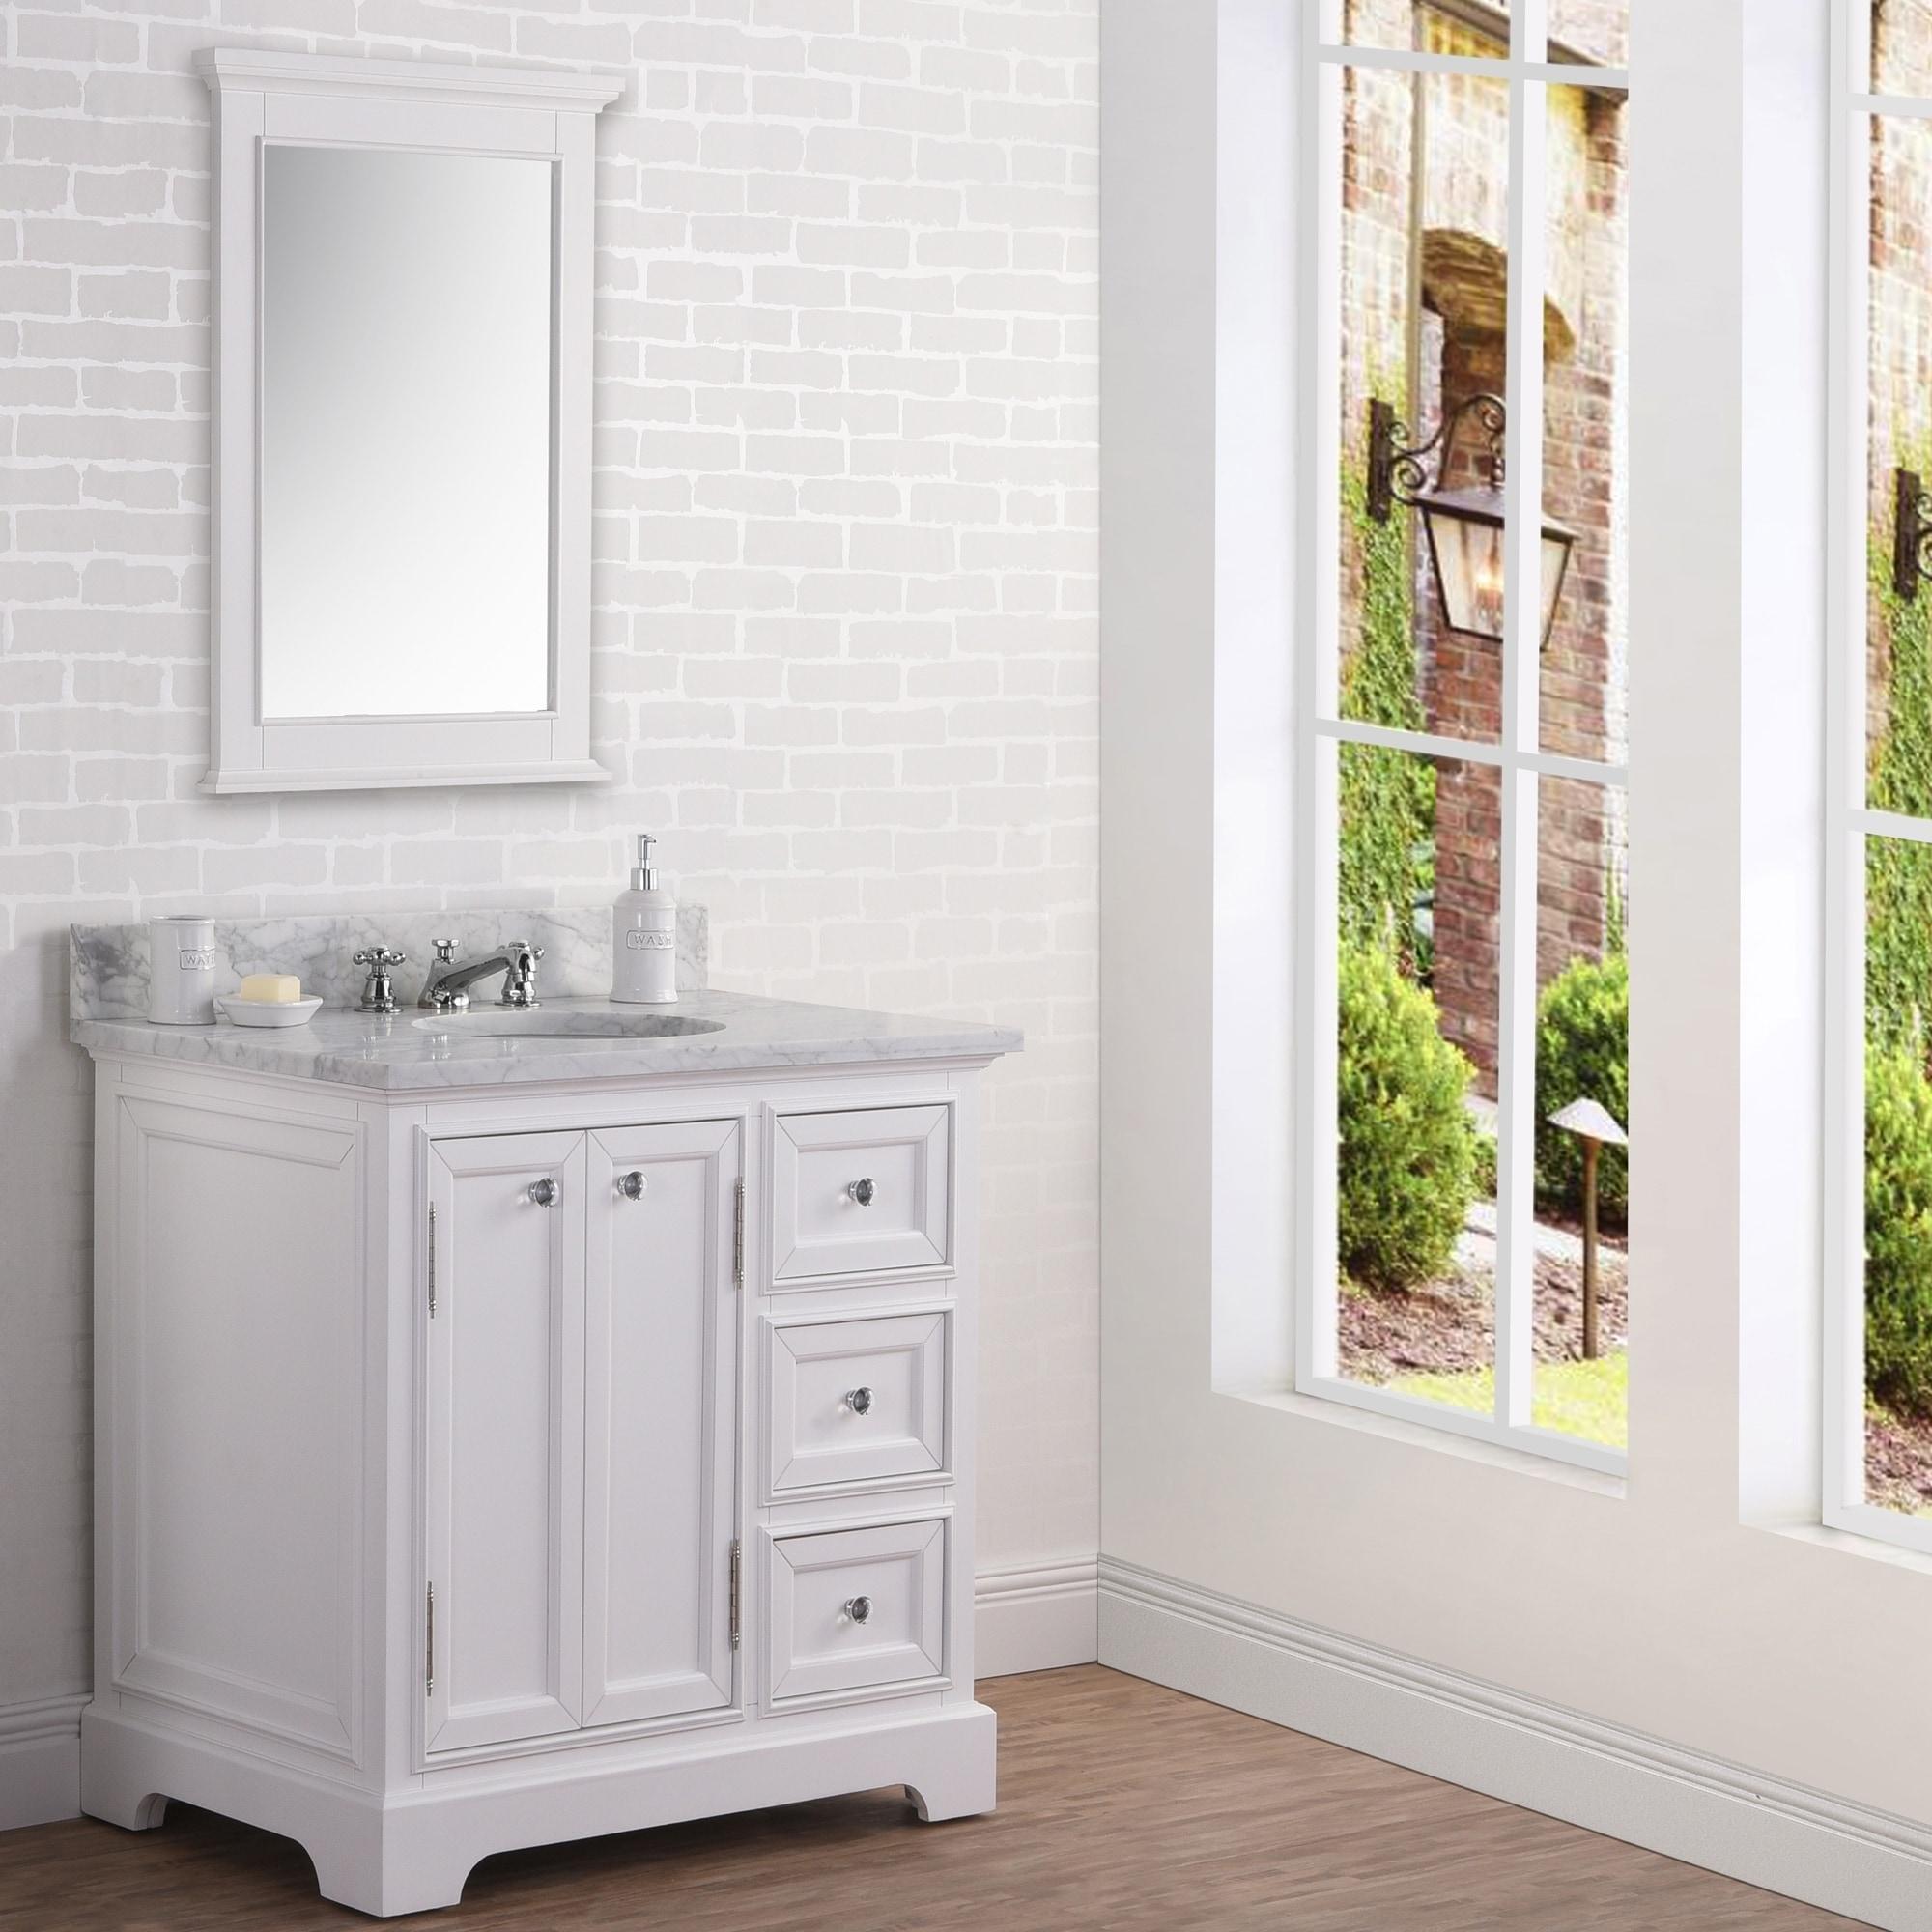 Single Sink Carrara Marble Bathroom